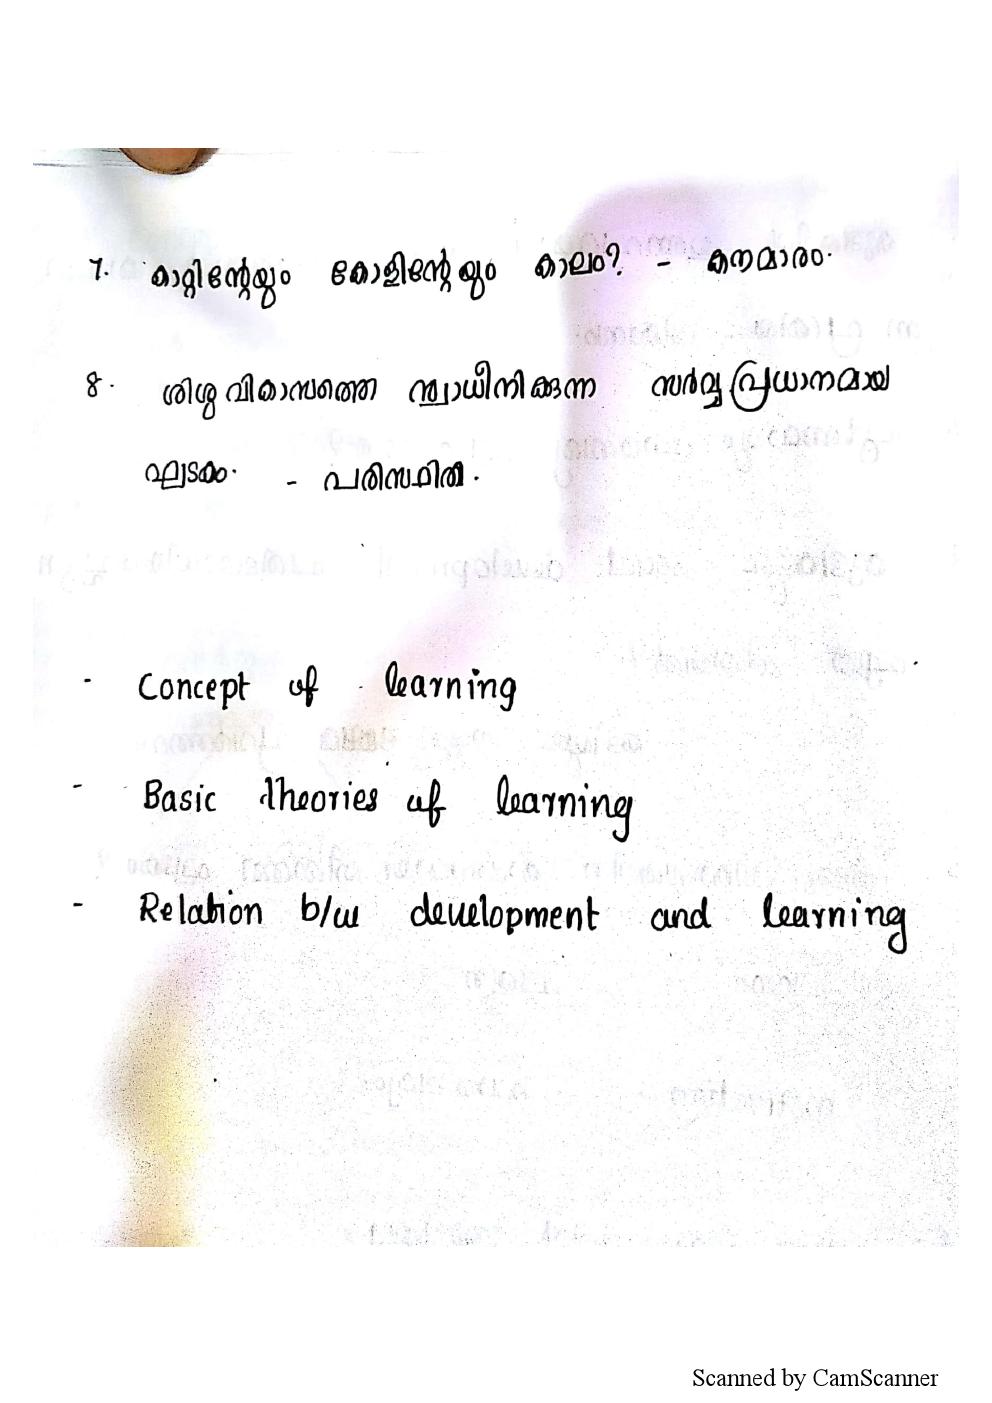 http://masterstudy.net/pdf/ktet_notes0008.png